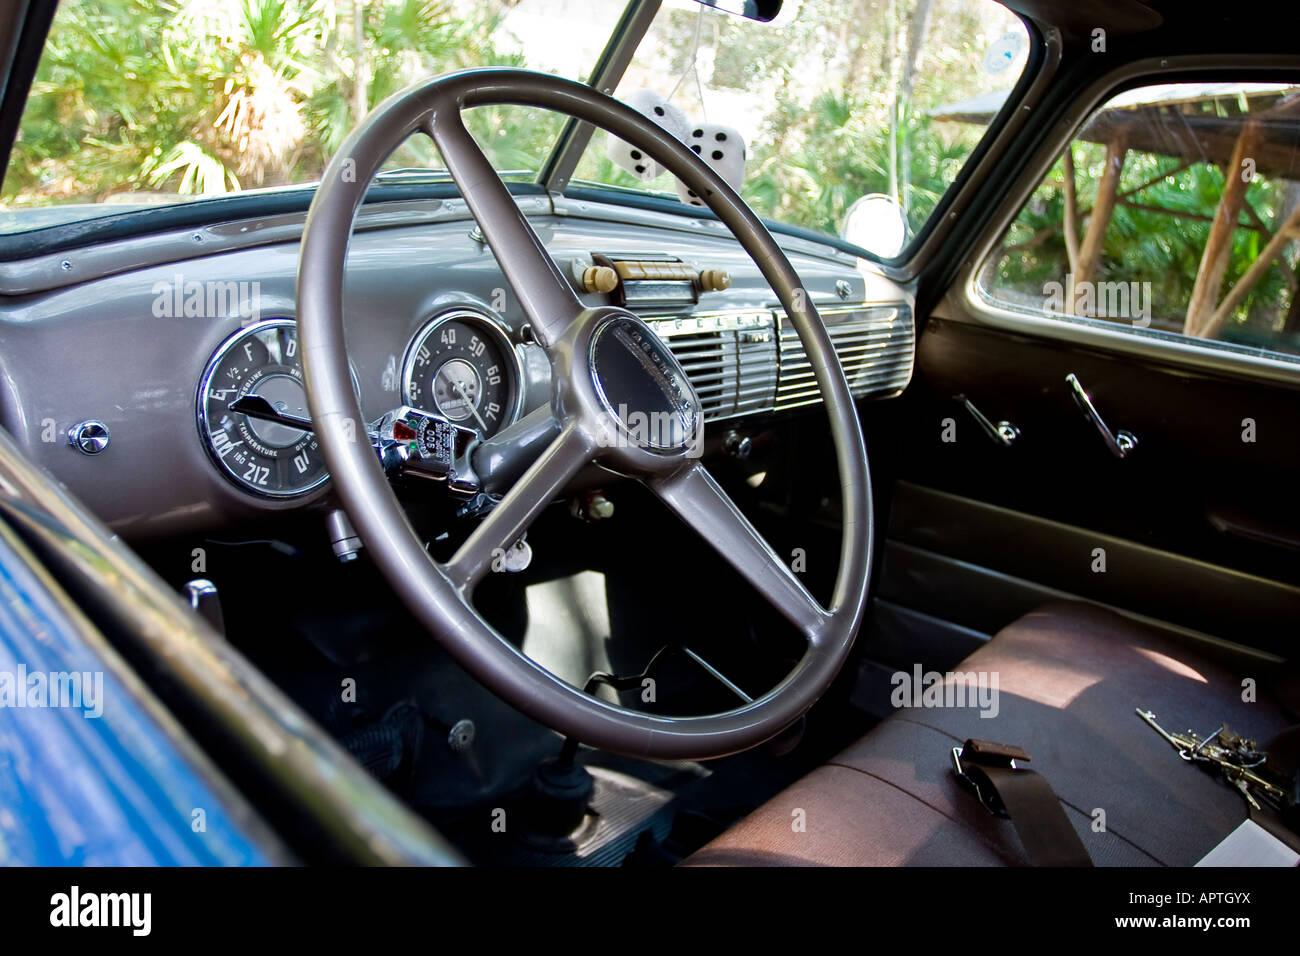 Dash And Steering Wheel Of 1950s Era Chevrolet Truck Stock Photo